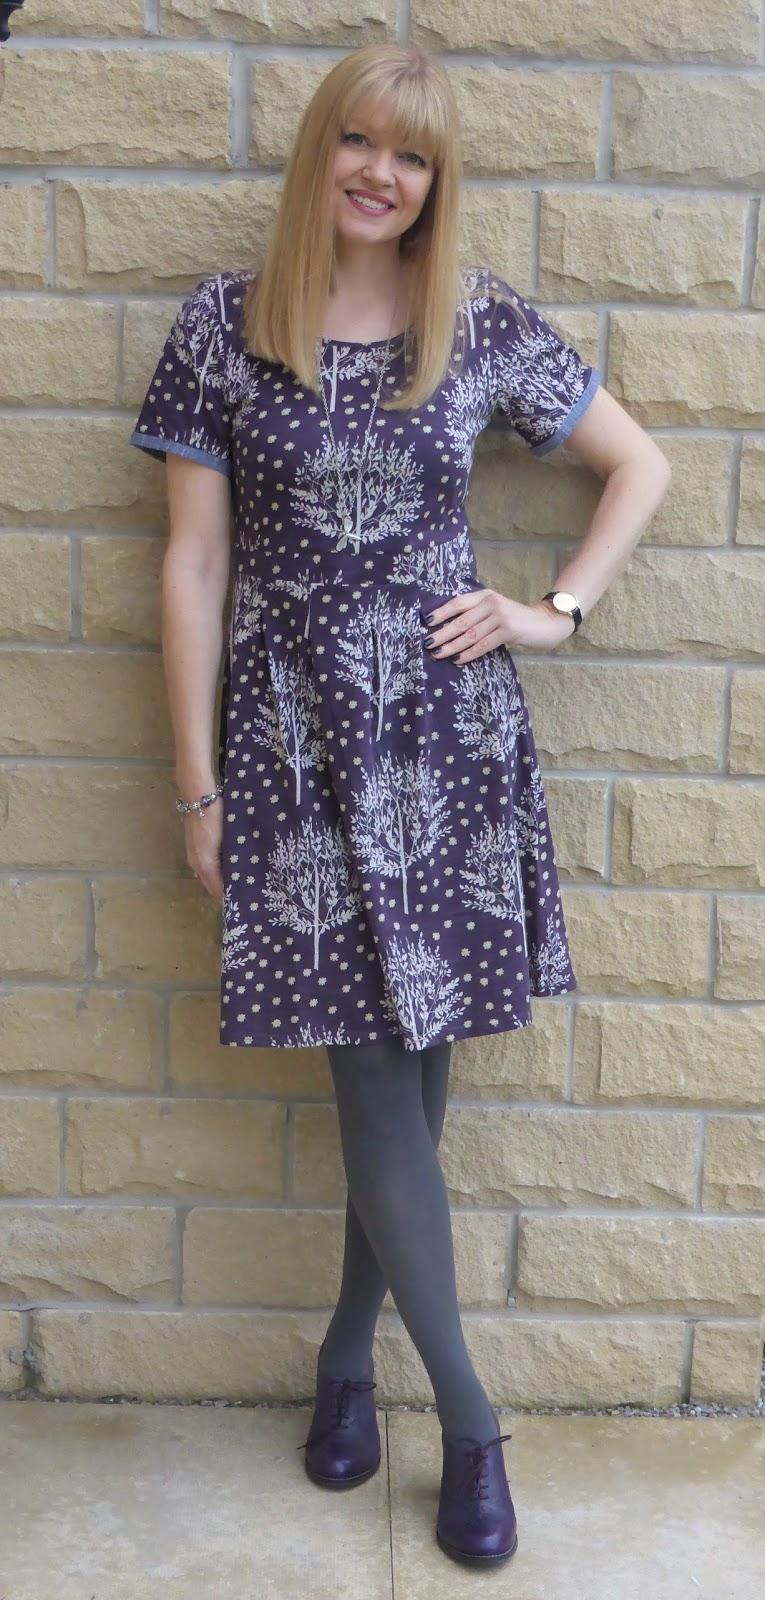 Purple Braintree dress with purple high-heeled brogues